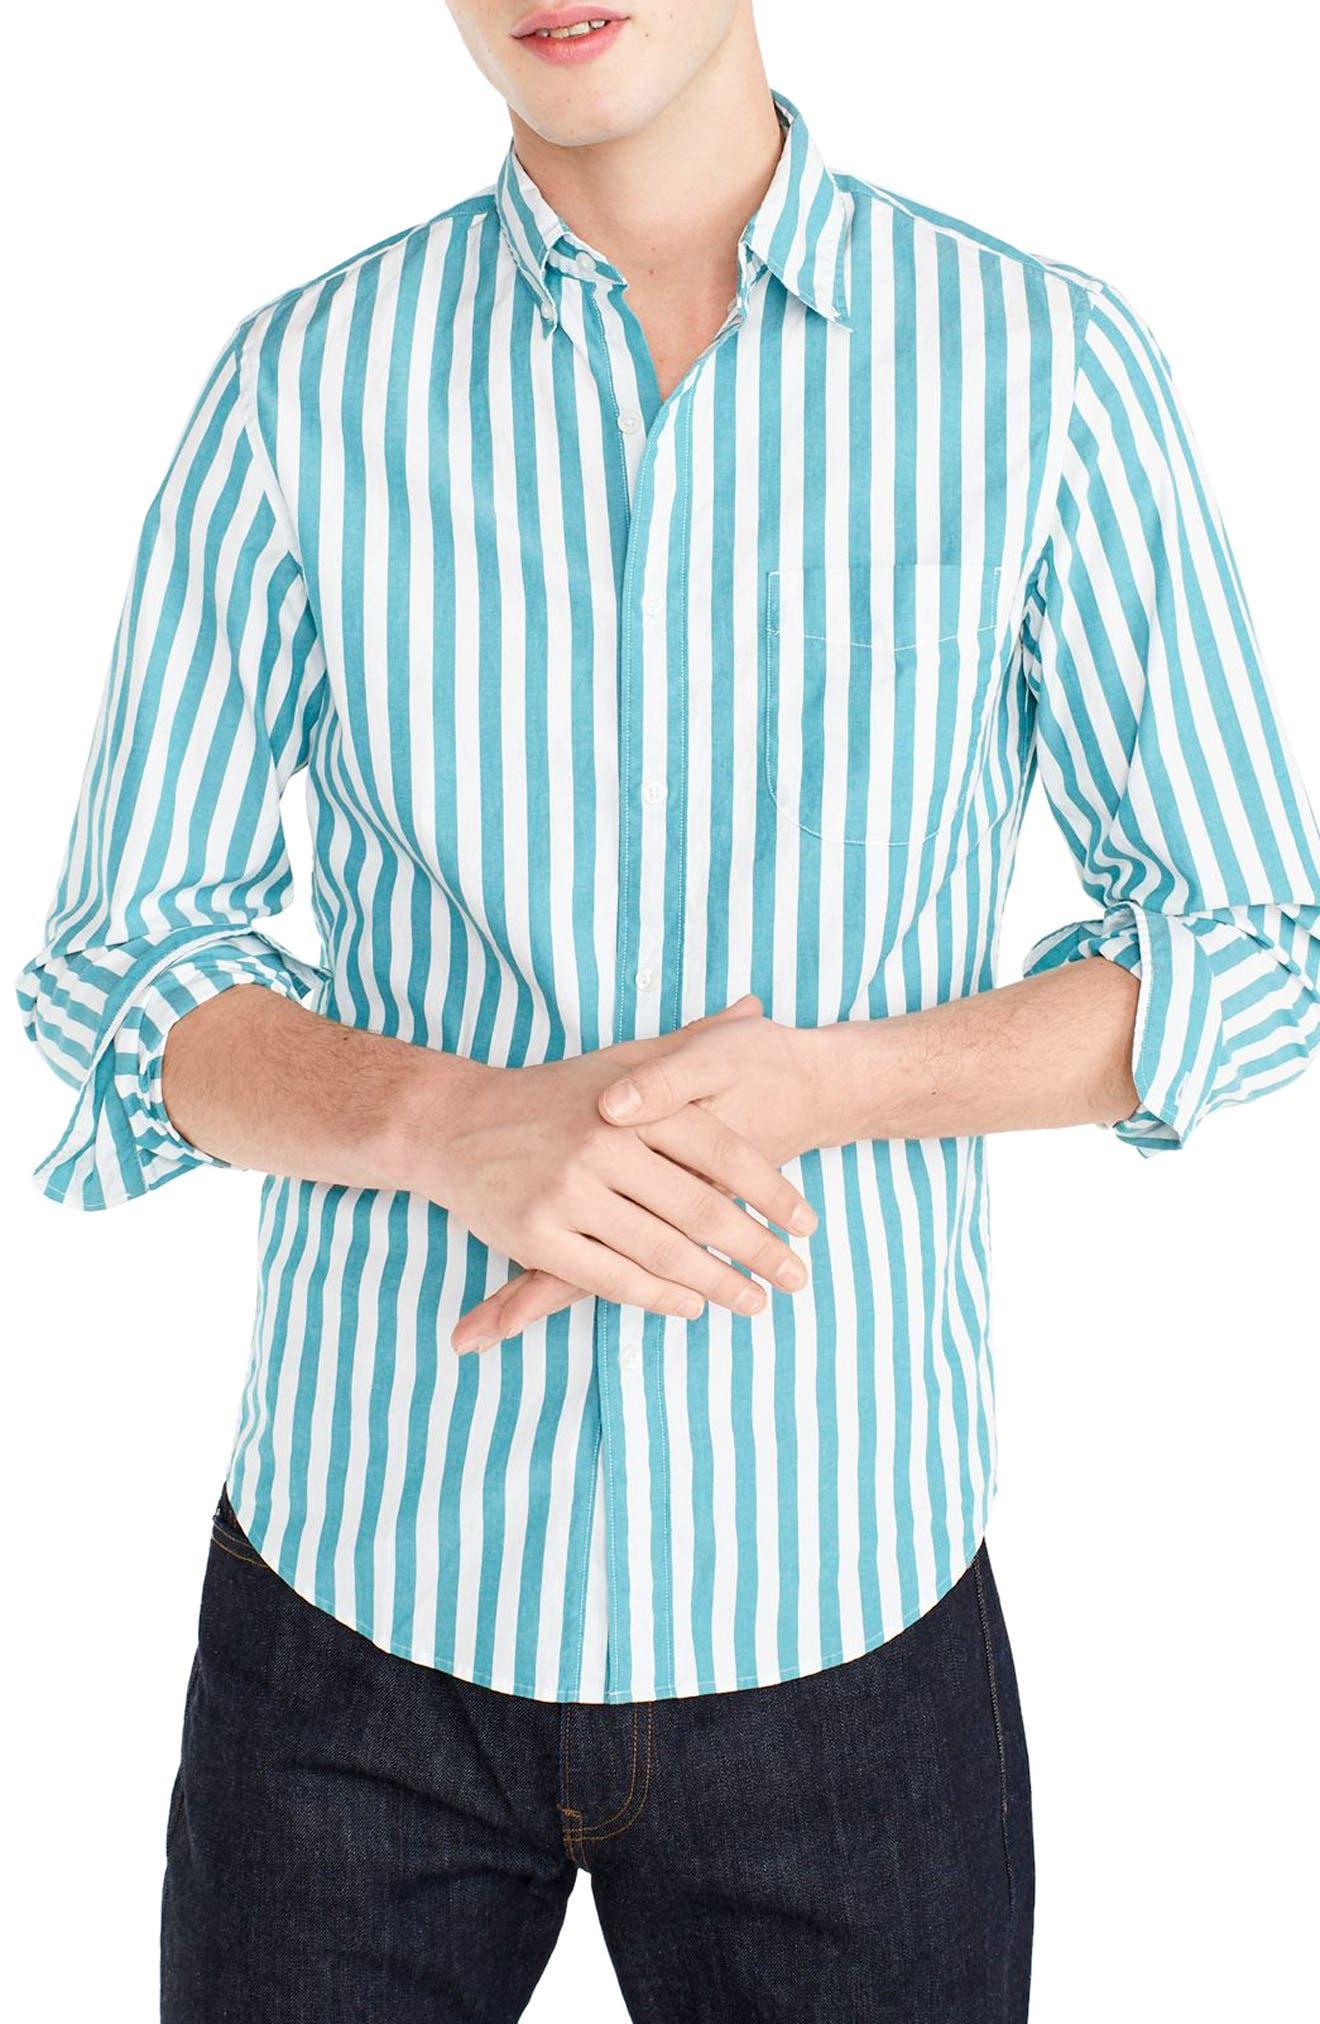 J.Crew Slim Fit Stretch Secret Wash Stripe Sport Shirt,                         Main,                         color, Bright Turquoise